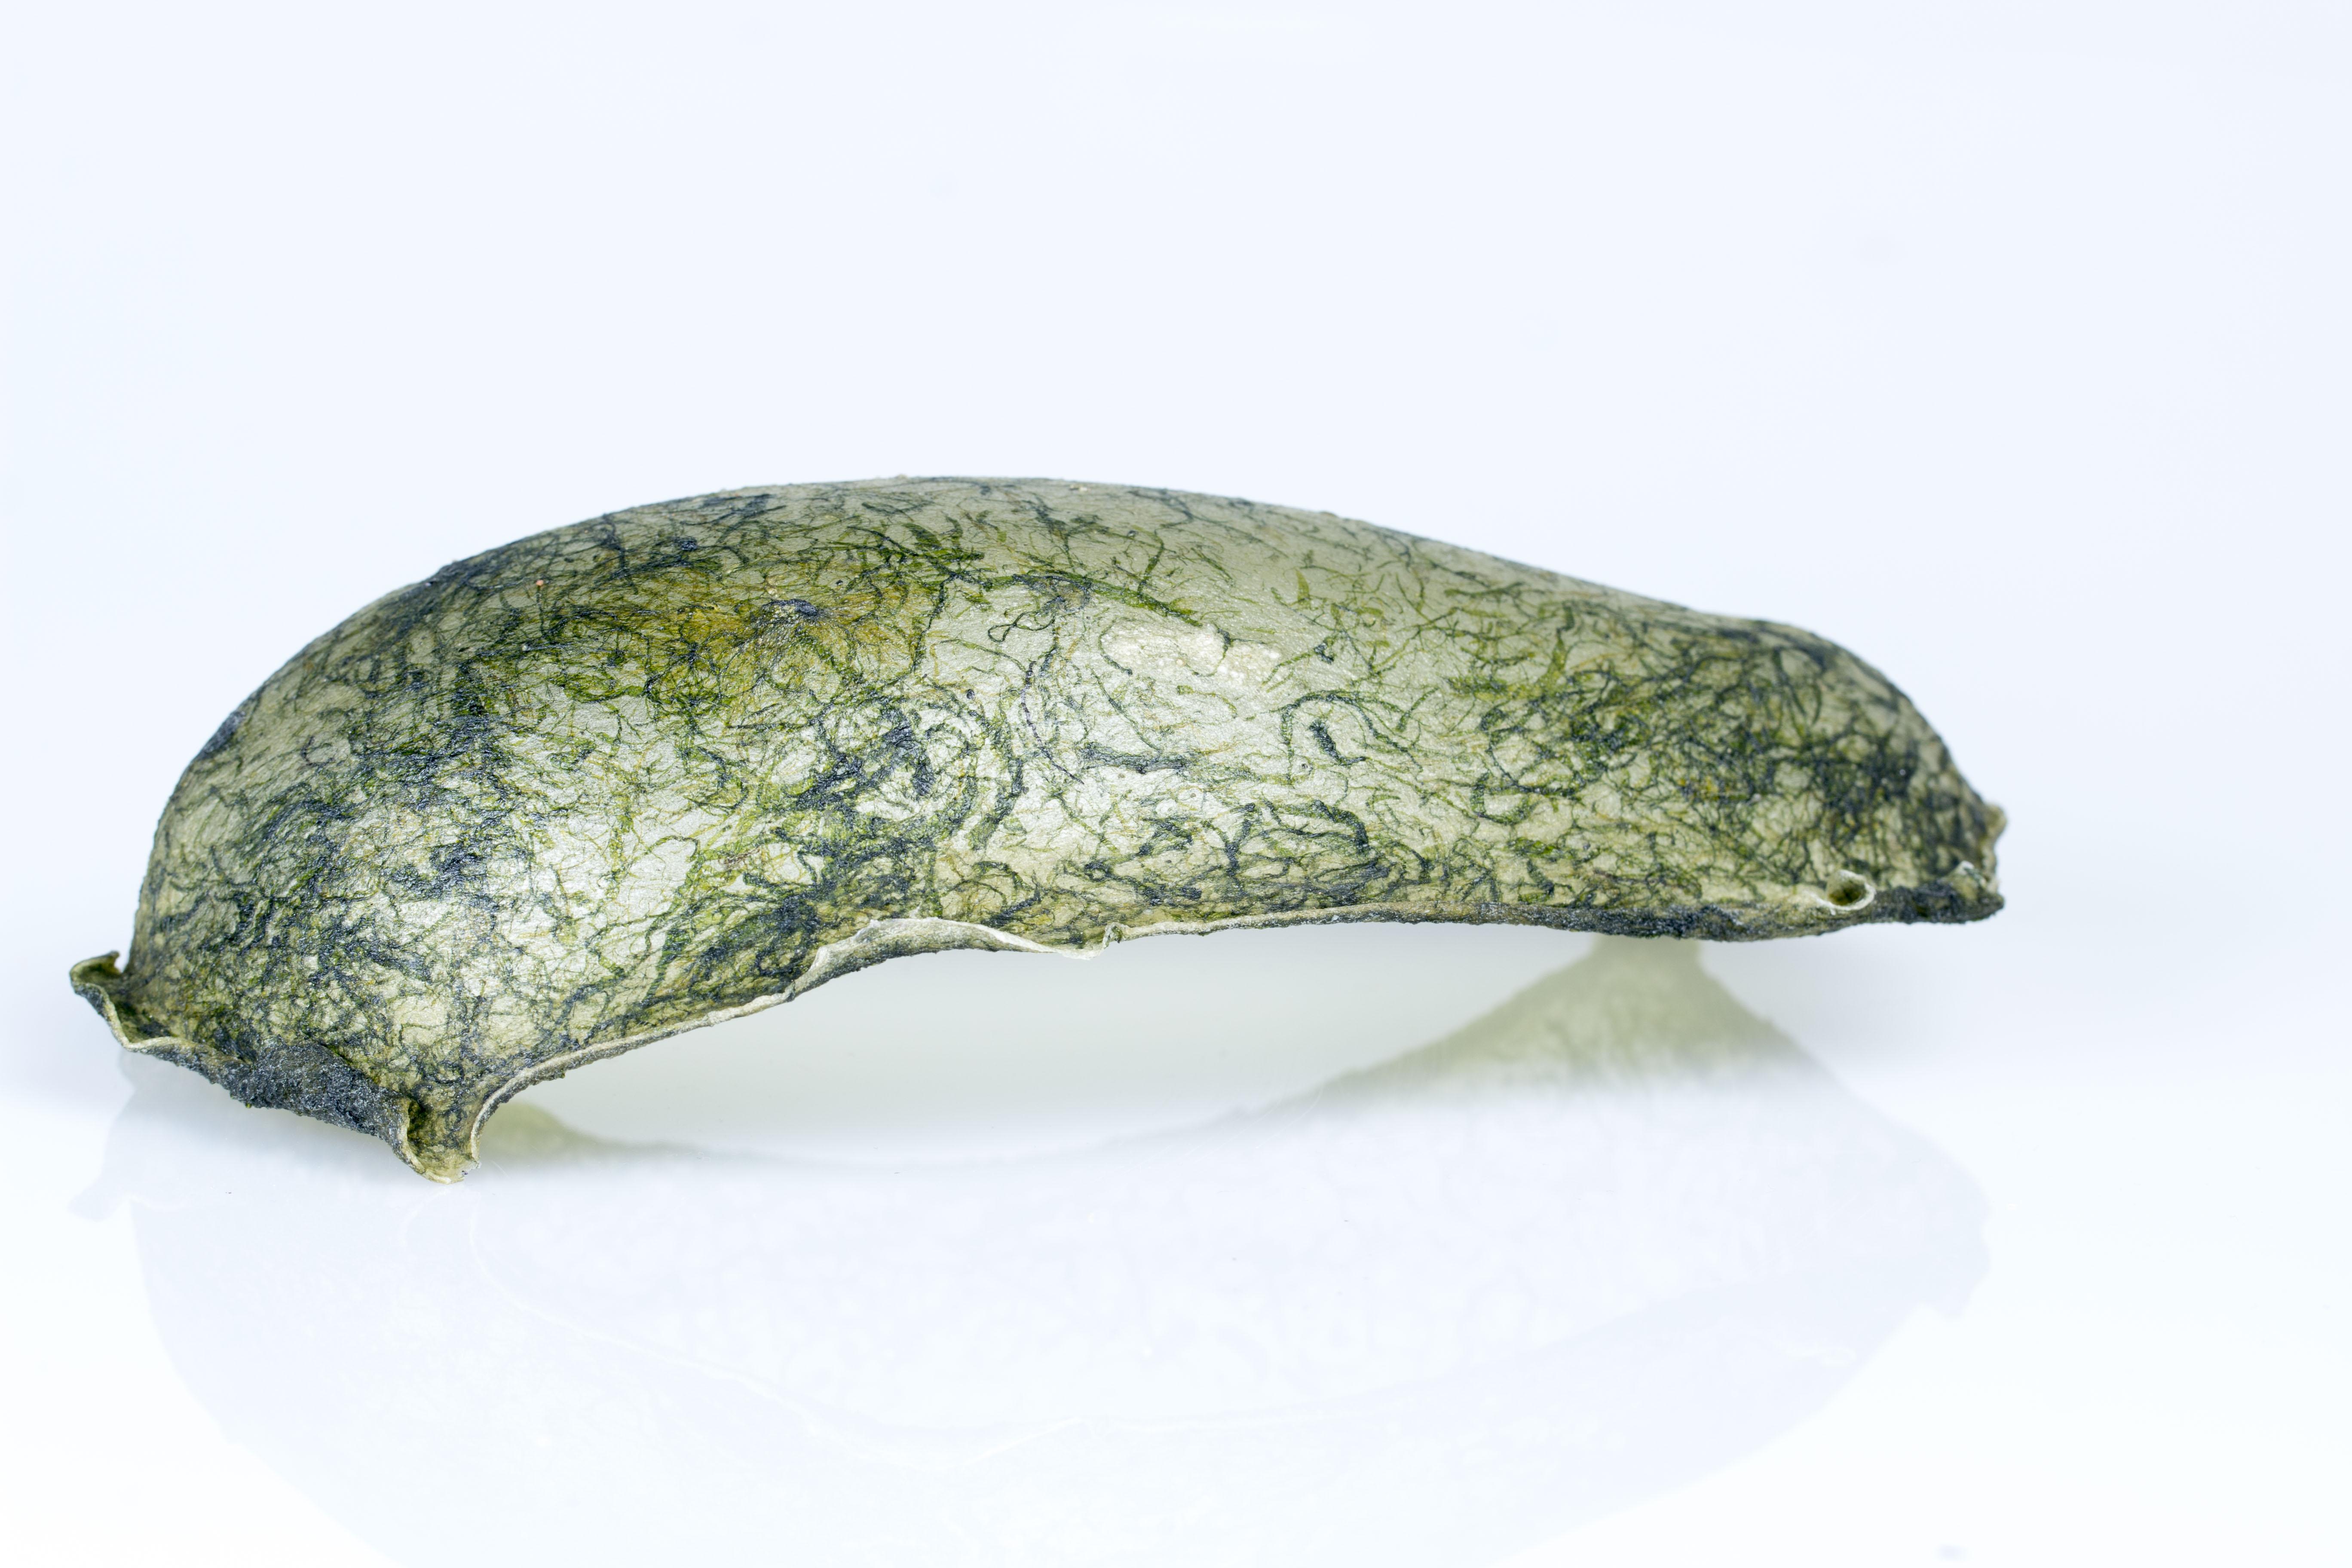 Biopõhine plastik vetikatest. Foto: Gerda Nurk